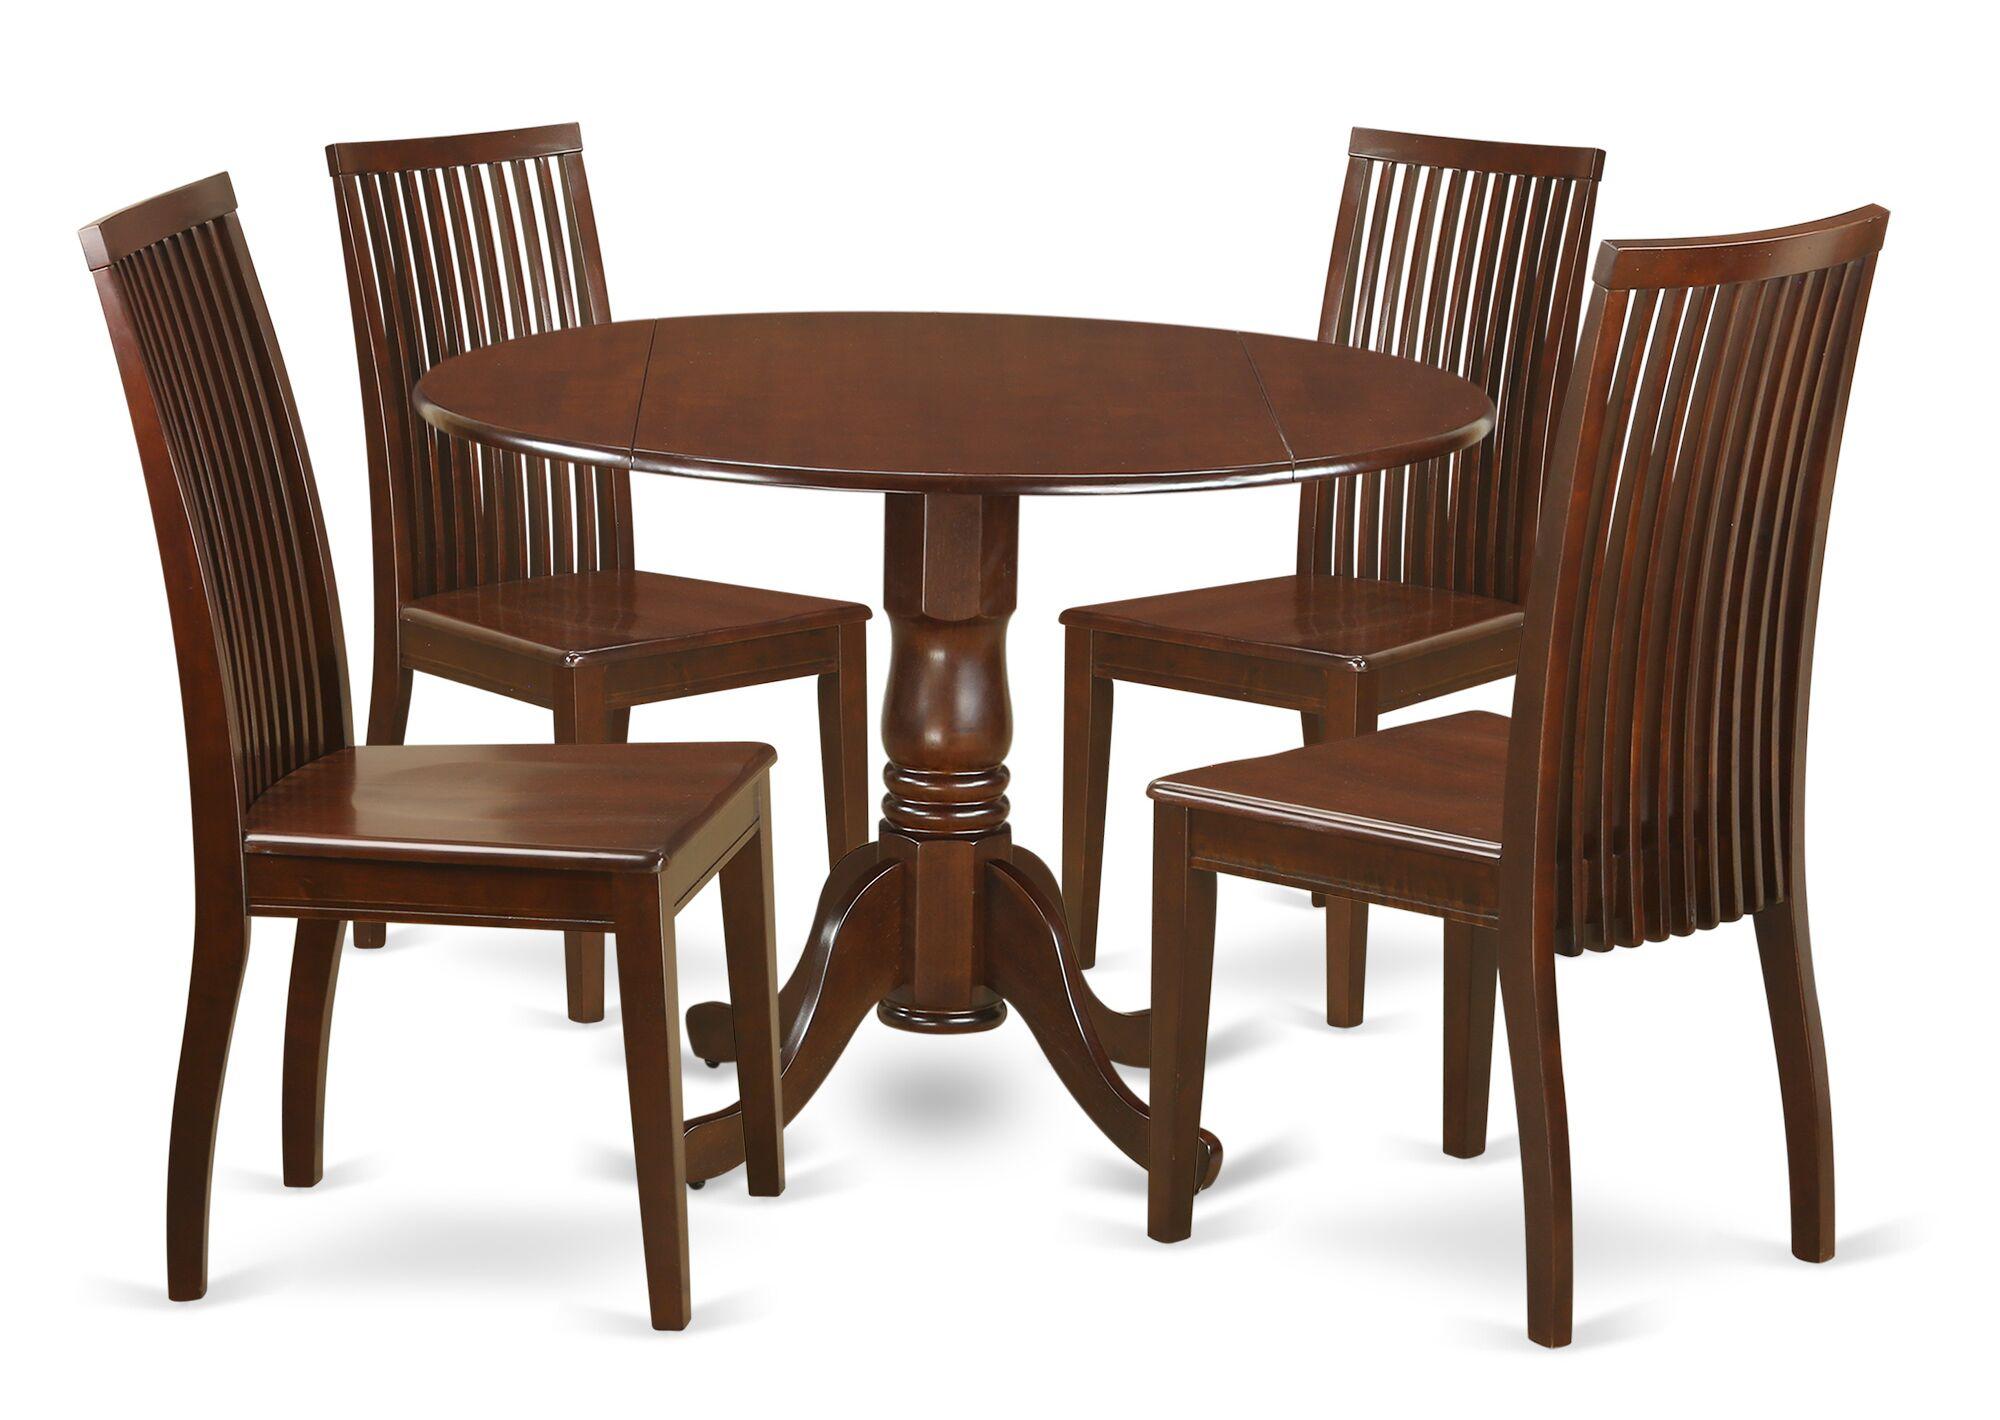 Dining Table Sets Gloucester 5 Piece Drop Leaf Breakfast Nook Solid Wood Set